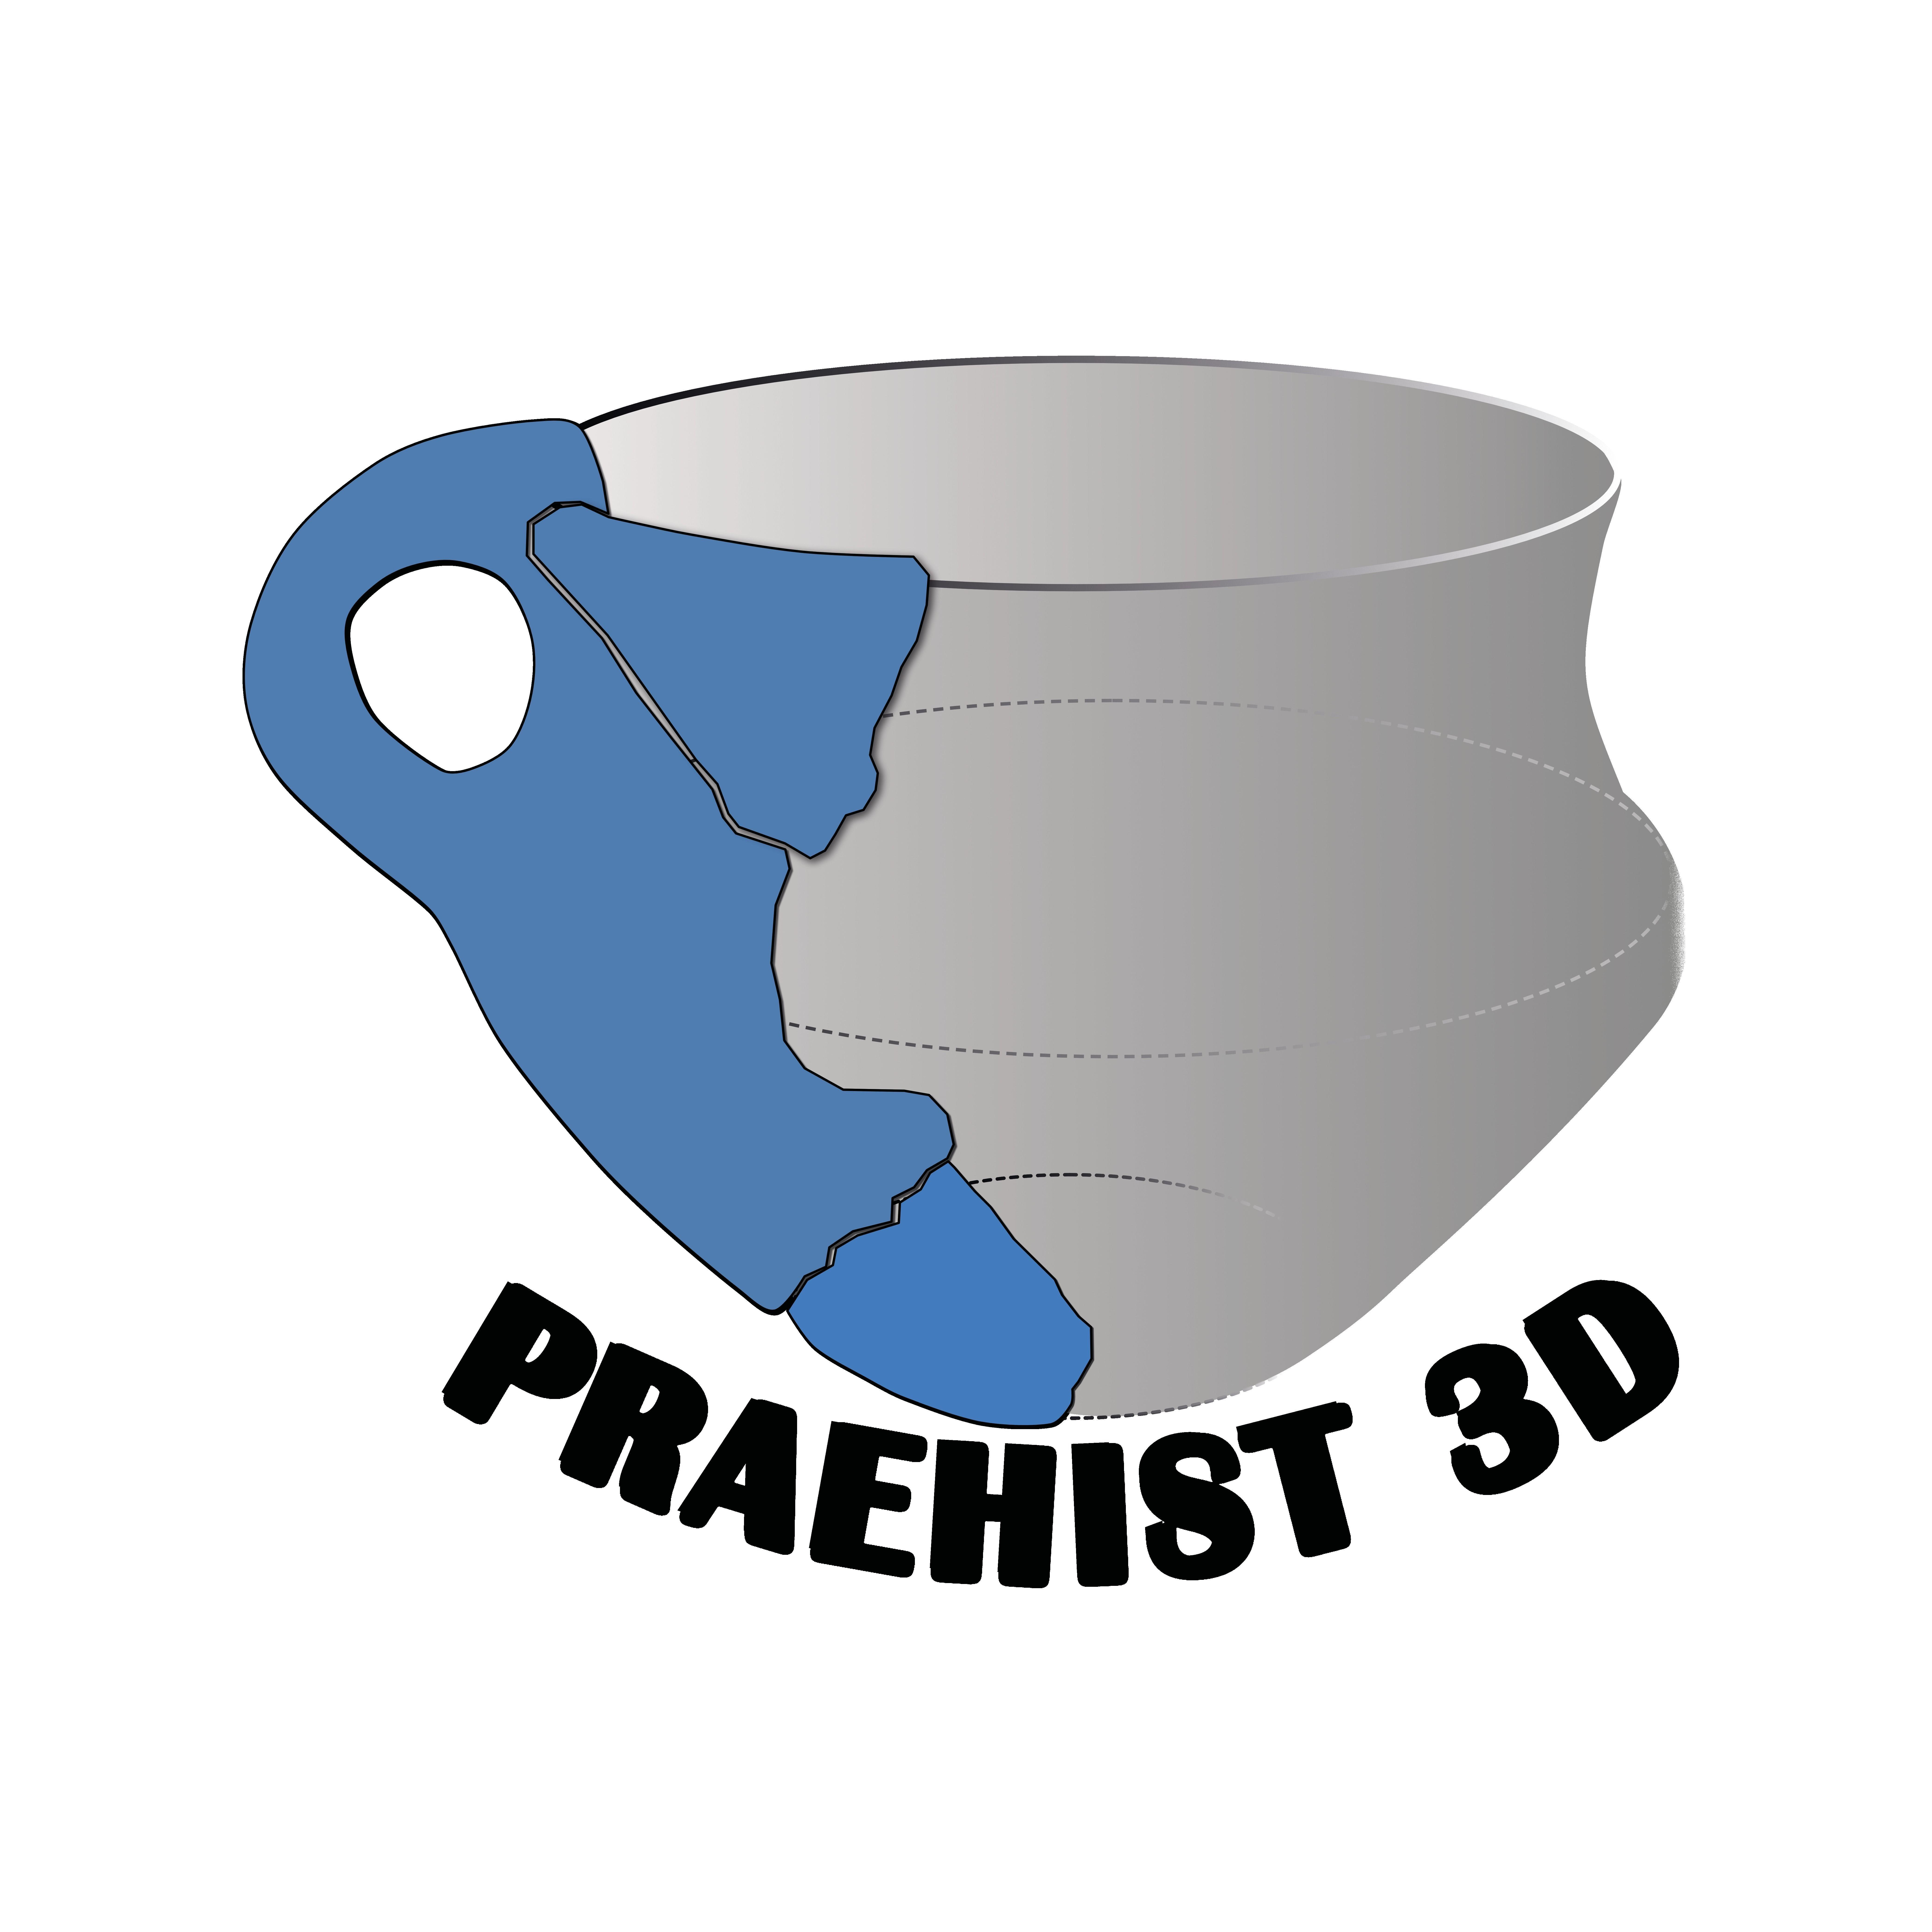 praehist3d